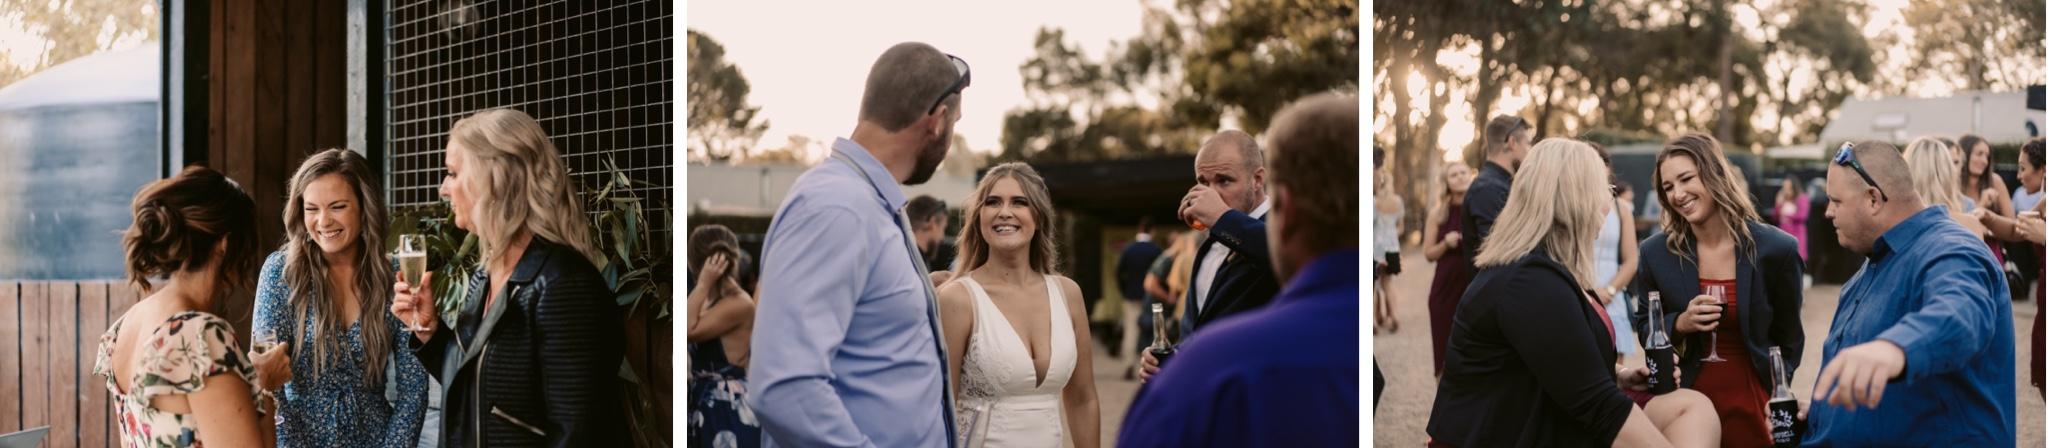 Mornington Peninsula Wedding Photography89.jpg